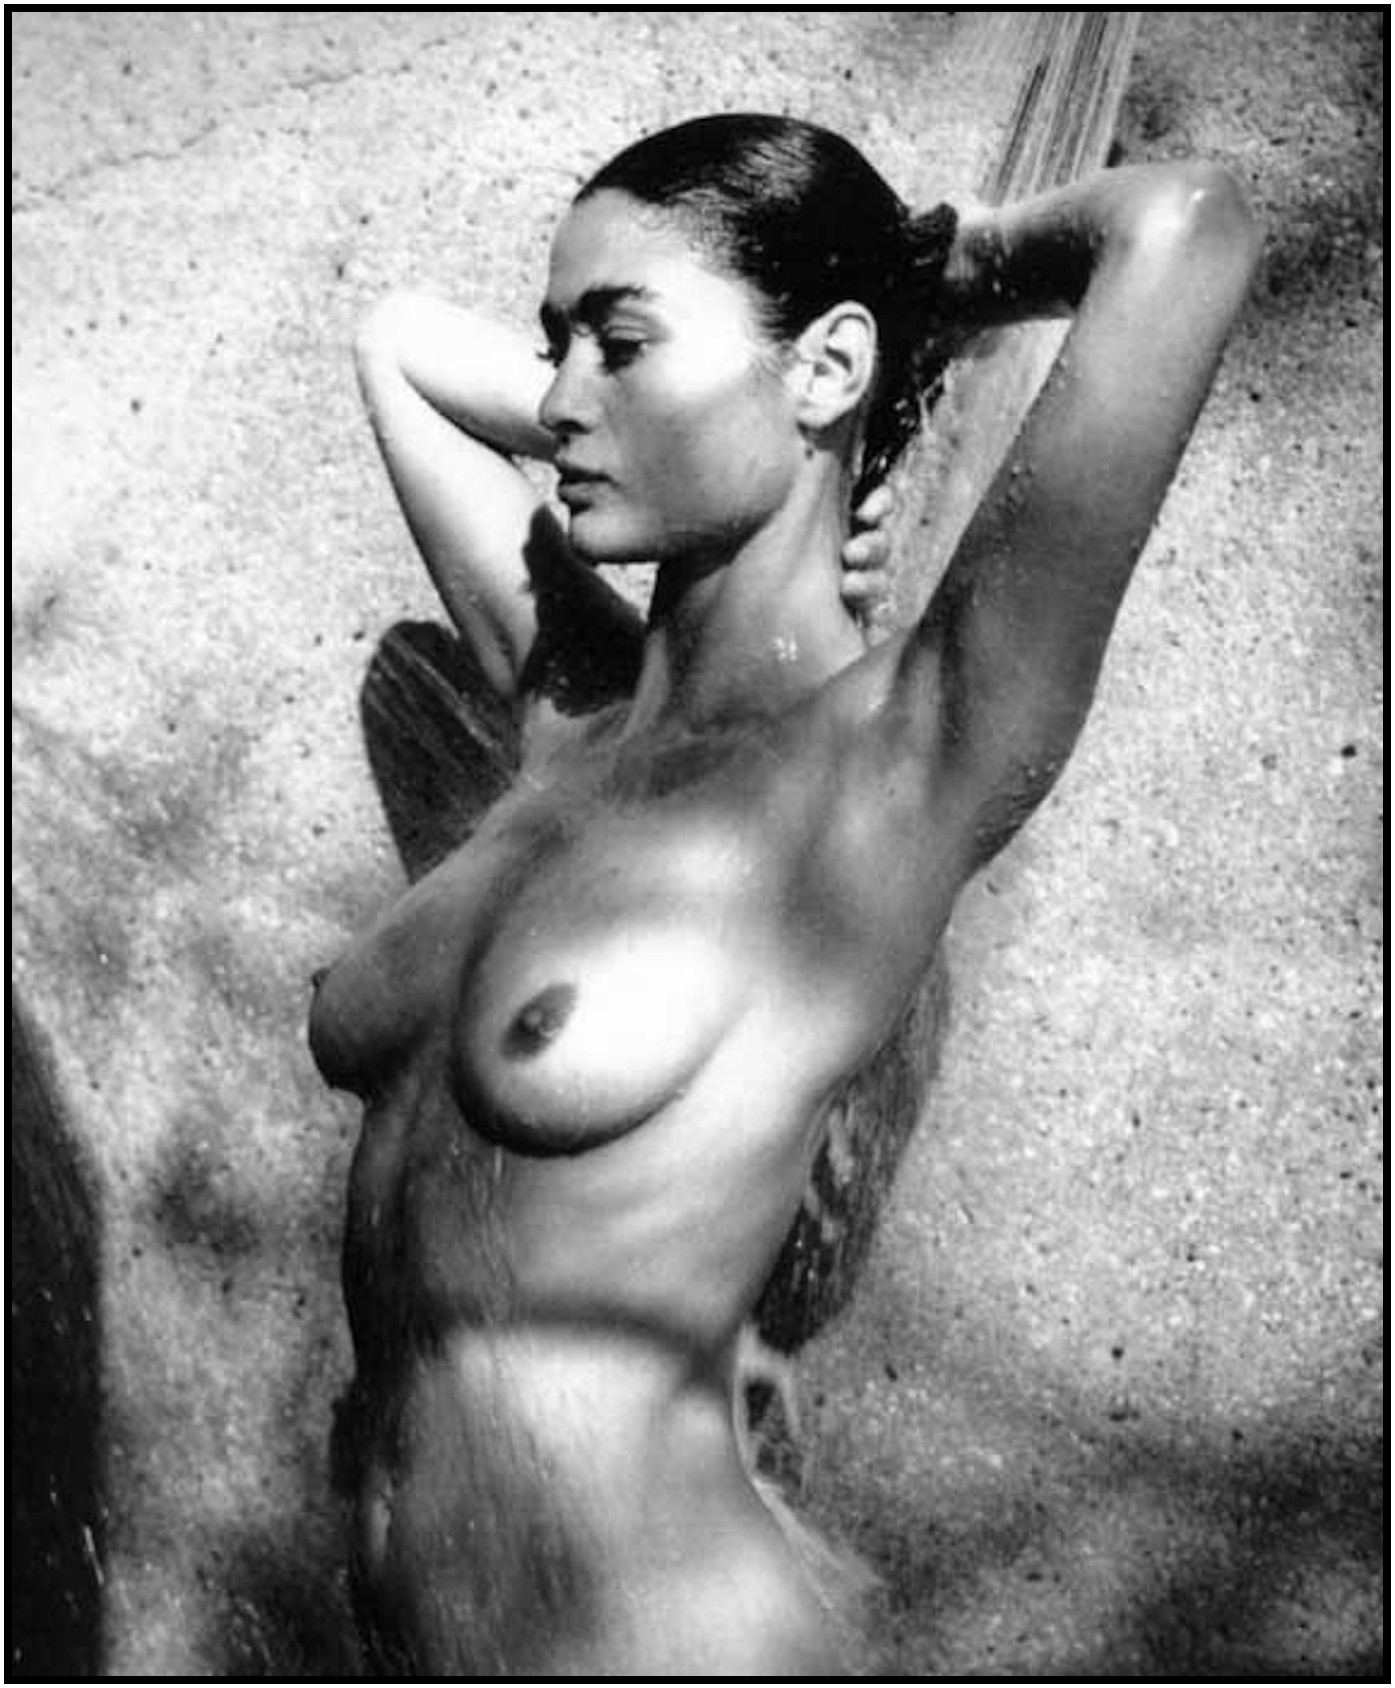 from Rodolfo redtube alyssa milano nude